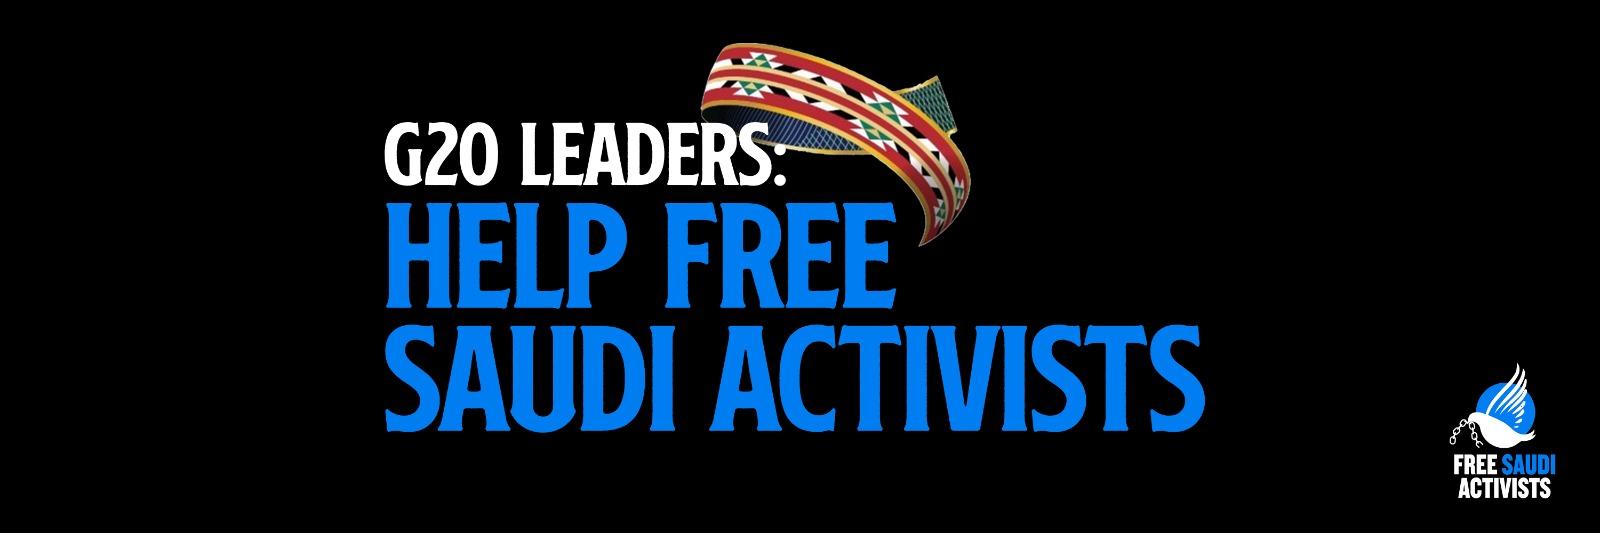 G20 Leaders: Help Free Saudi Activists